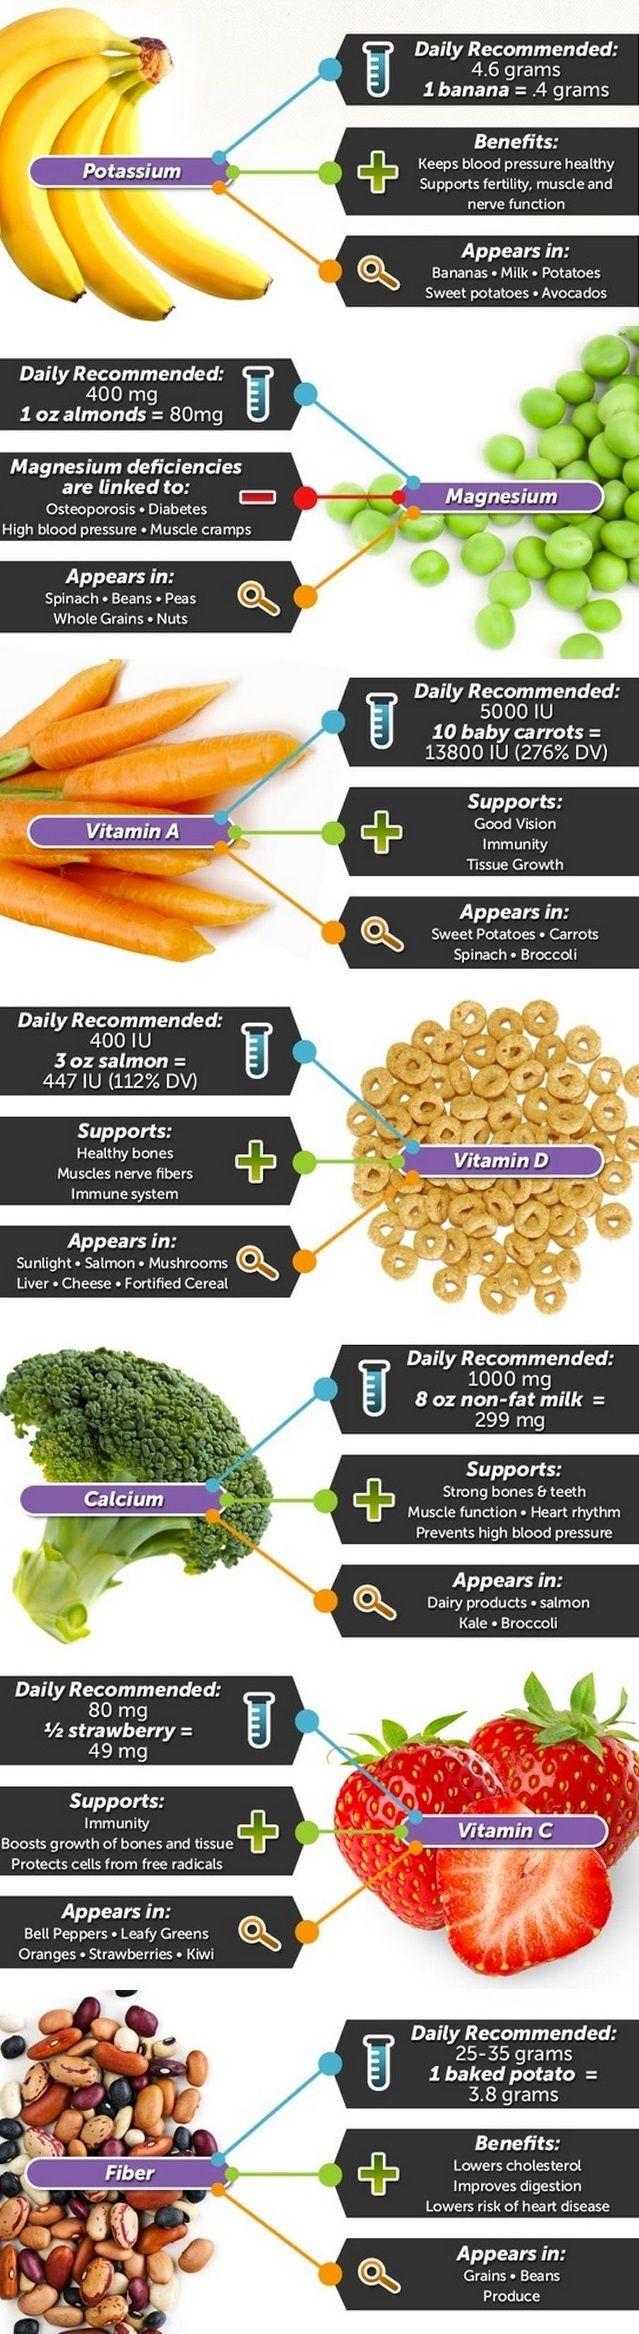 Food is medicine.  www.onedoterracommunity.com   https://www.facebook.com/#!/OneDoterraCommunity